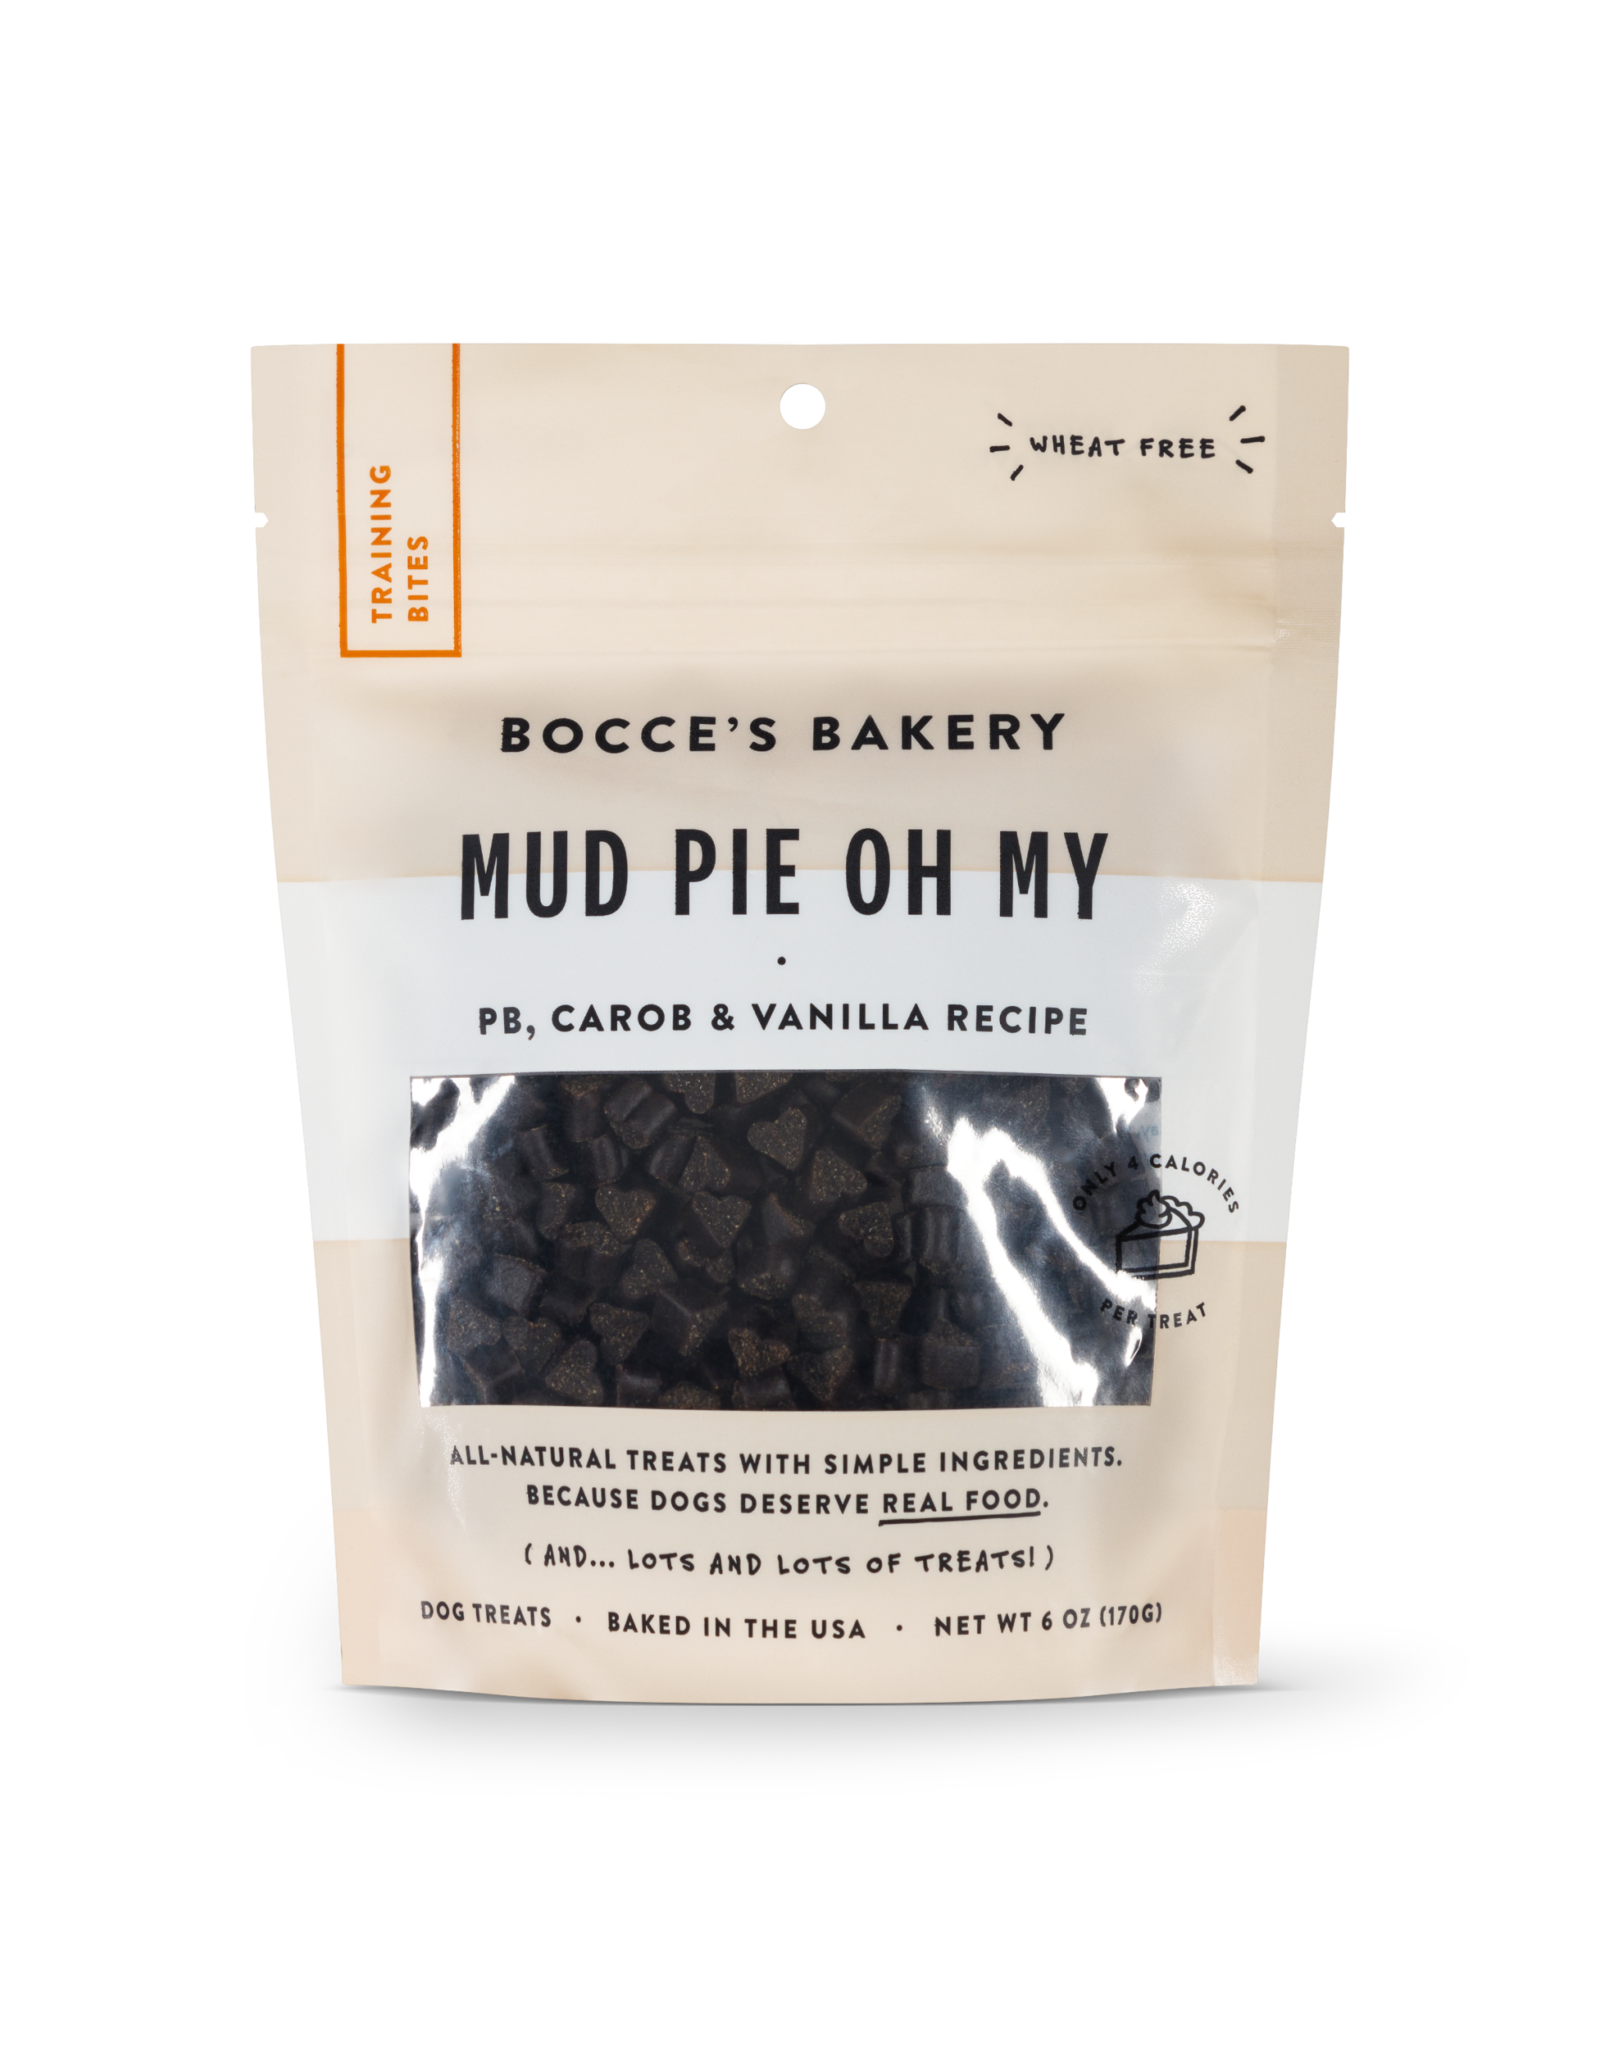 Bocce's Bakery Bocce's Bakery: Training Bites Mud Pie Oh My, 6 oz